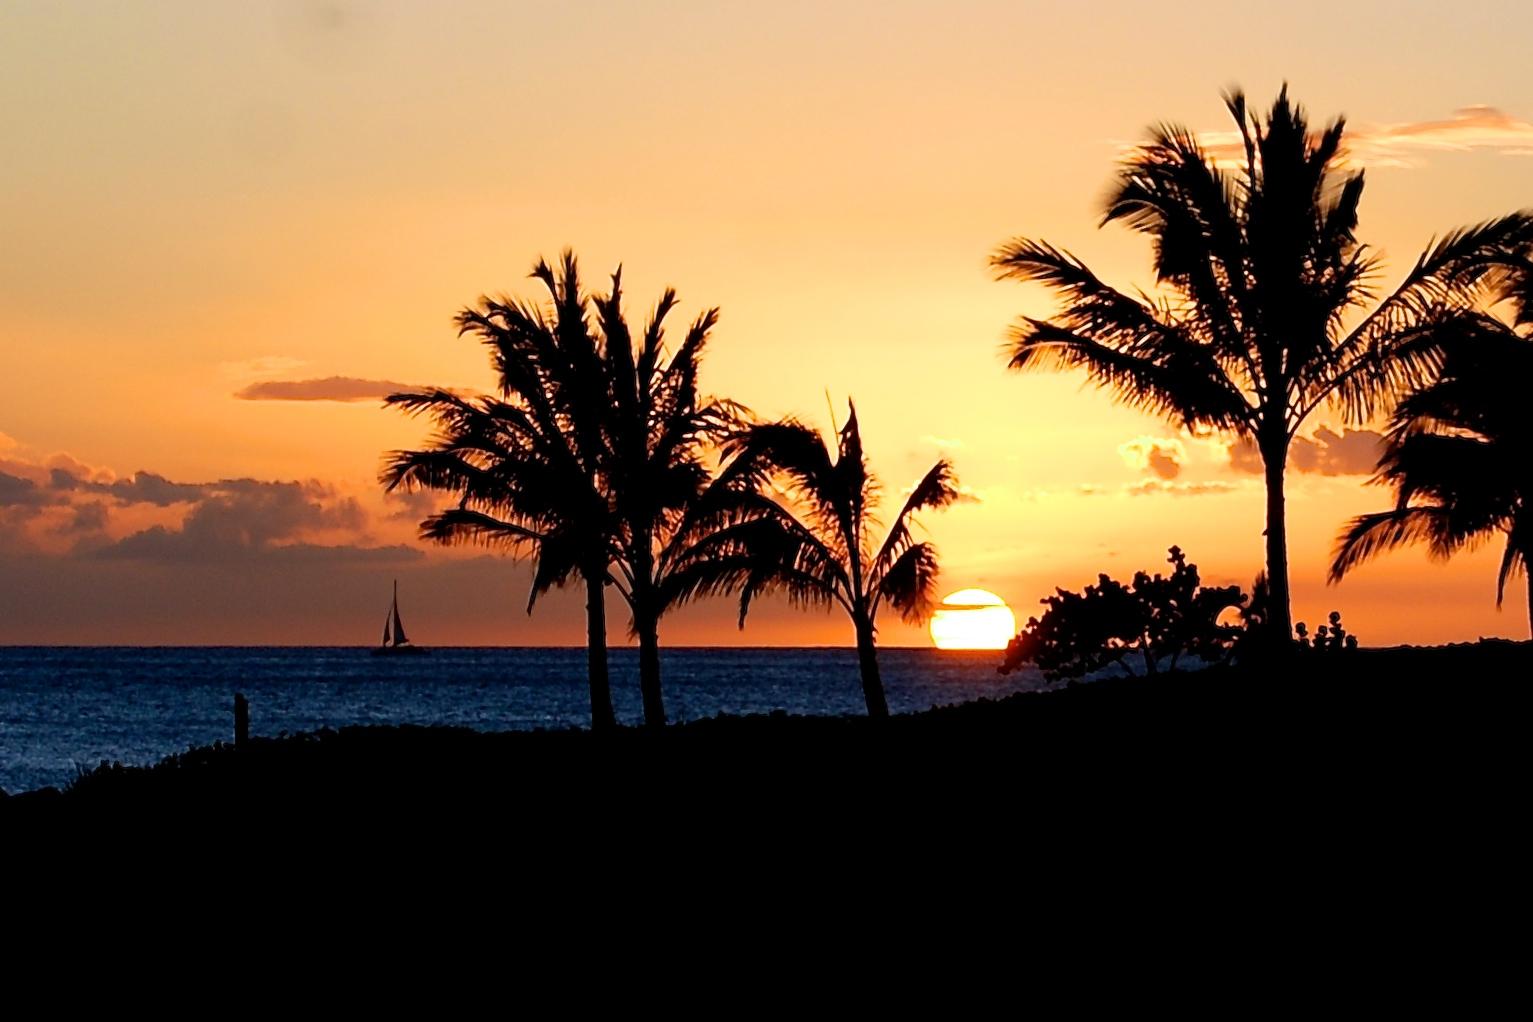 Ko Olina Hawaii Sunset